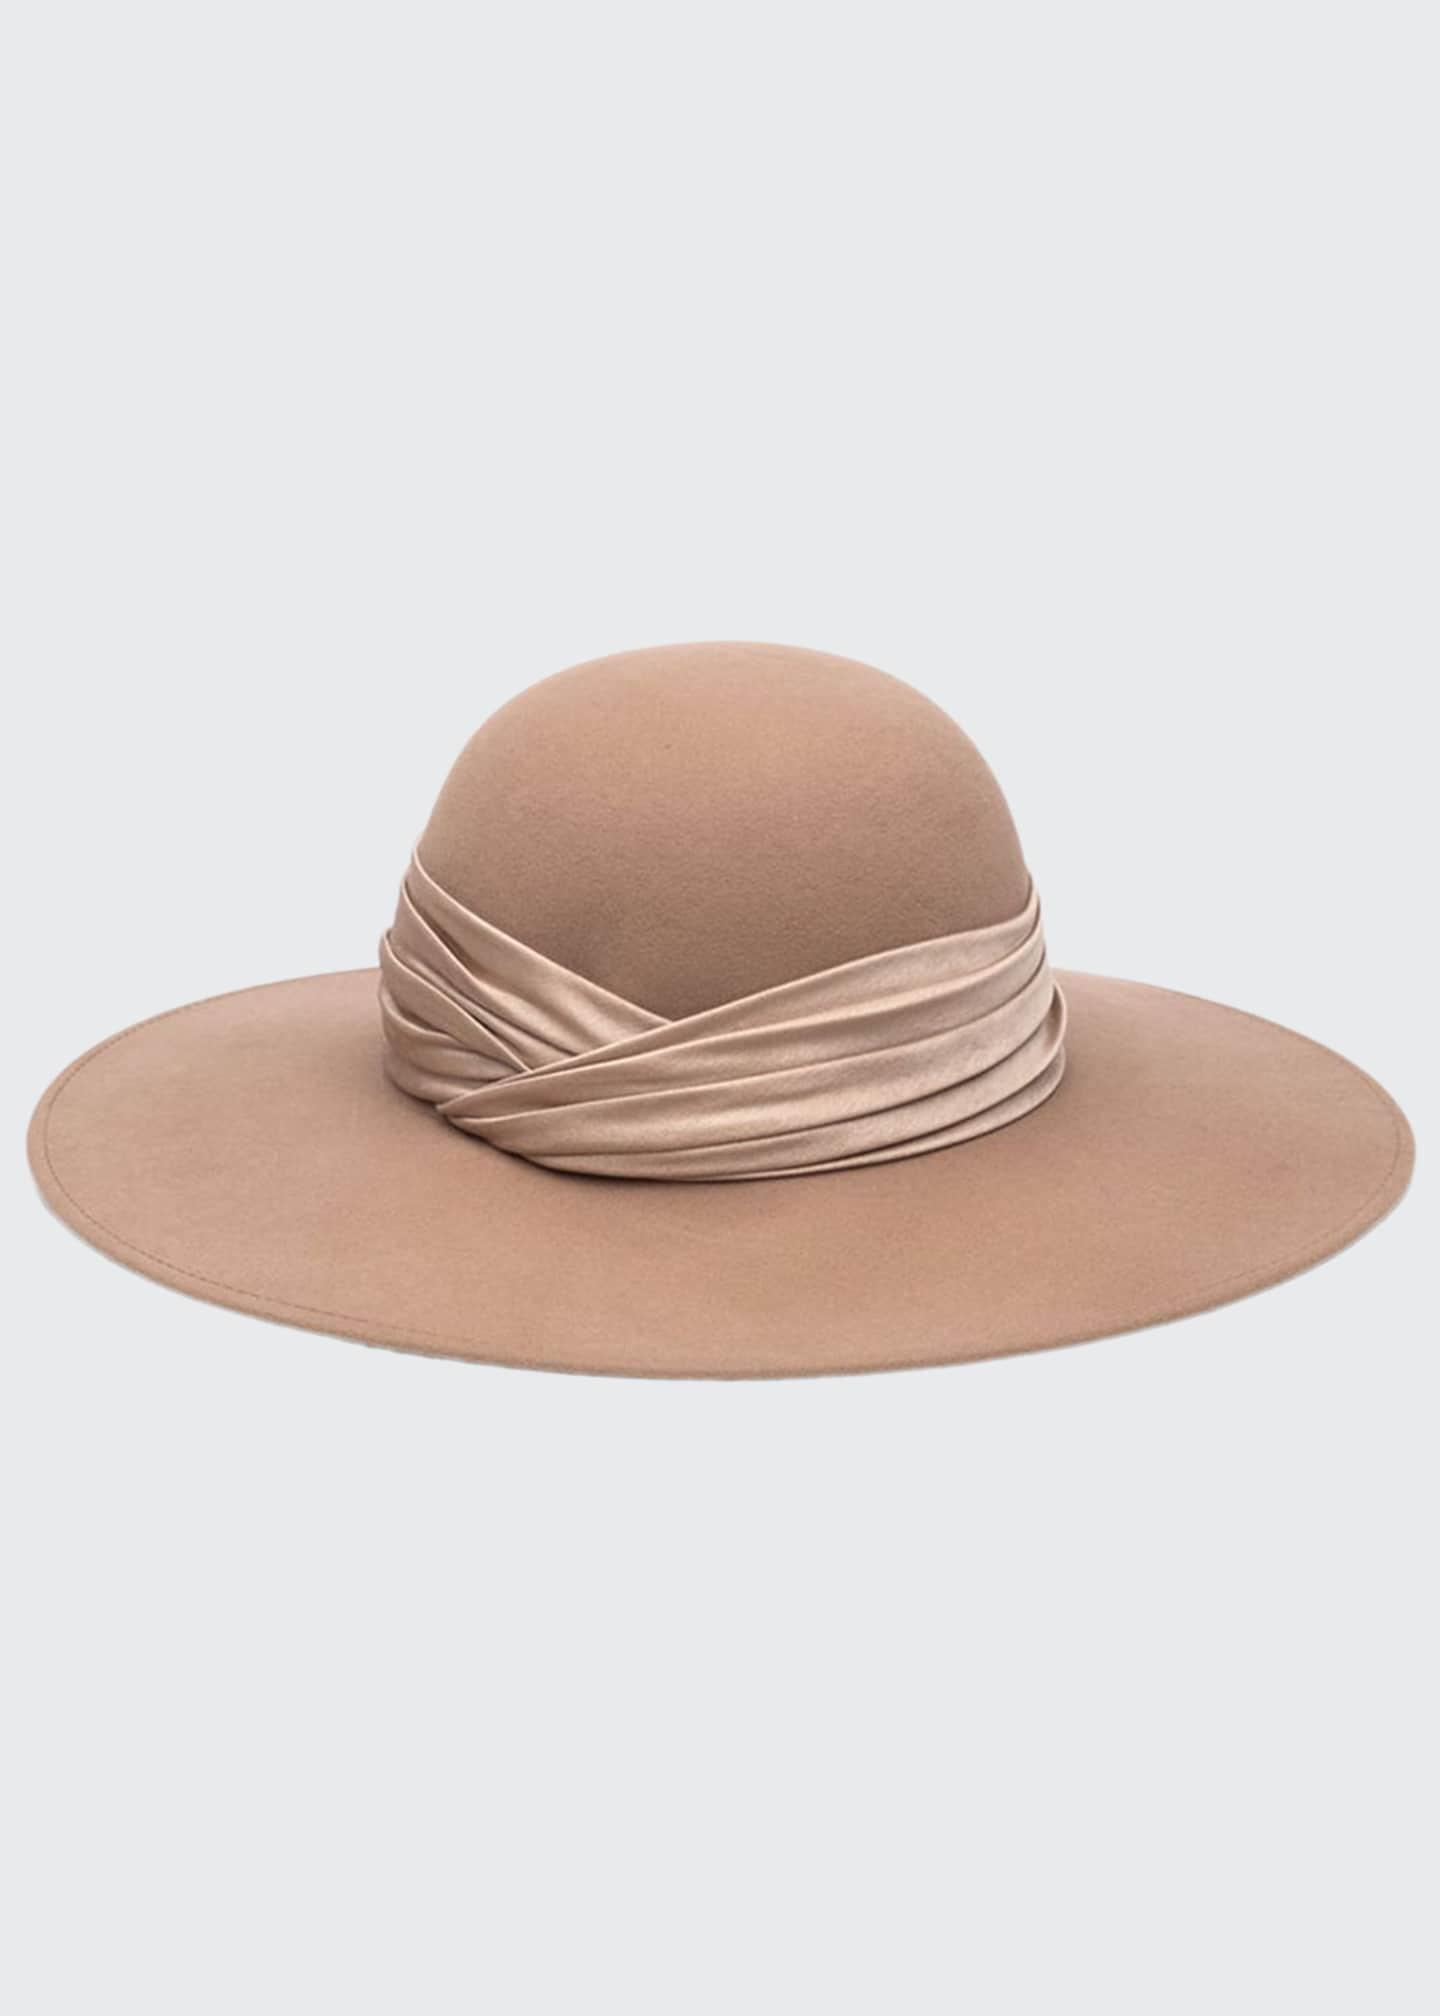 Eugenia Kim Honey Wool Large Brim Hat